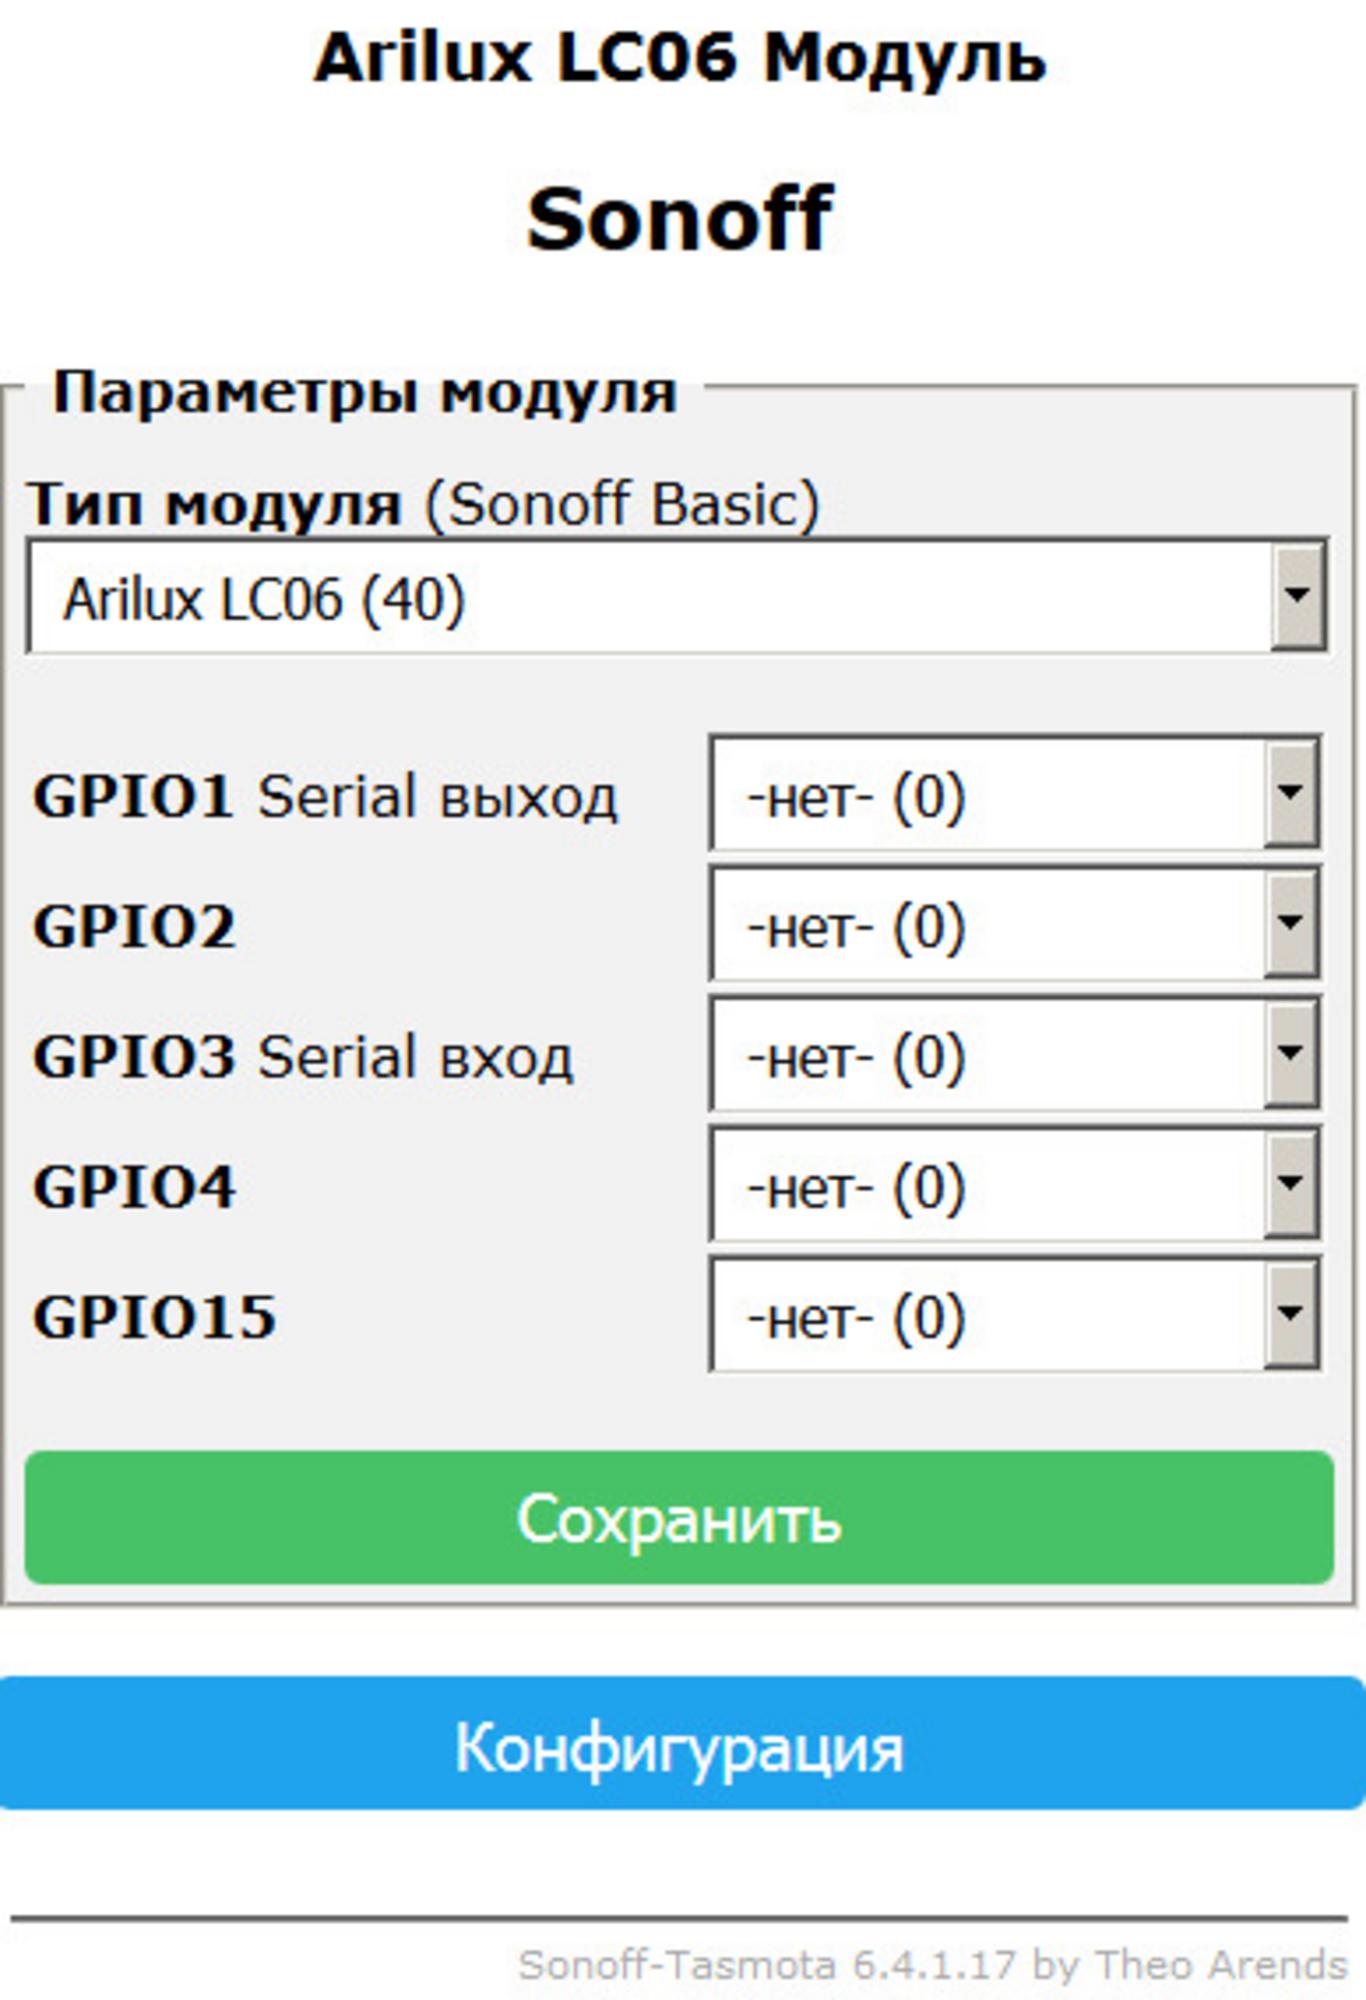 2000x2000x_image.png?1550714837